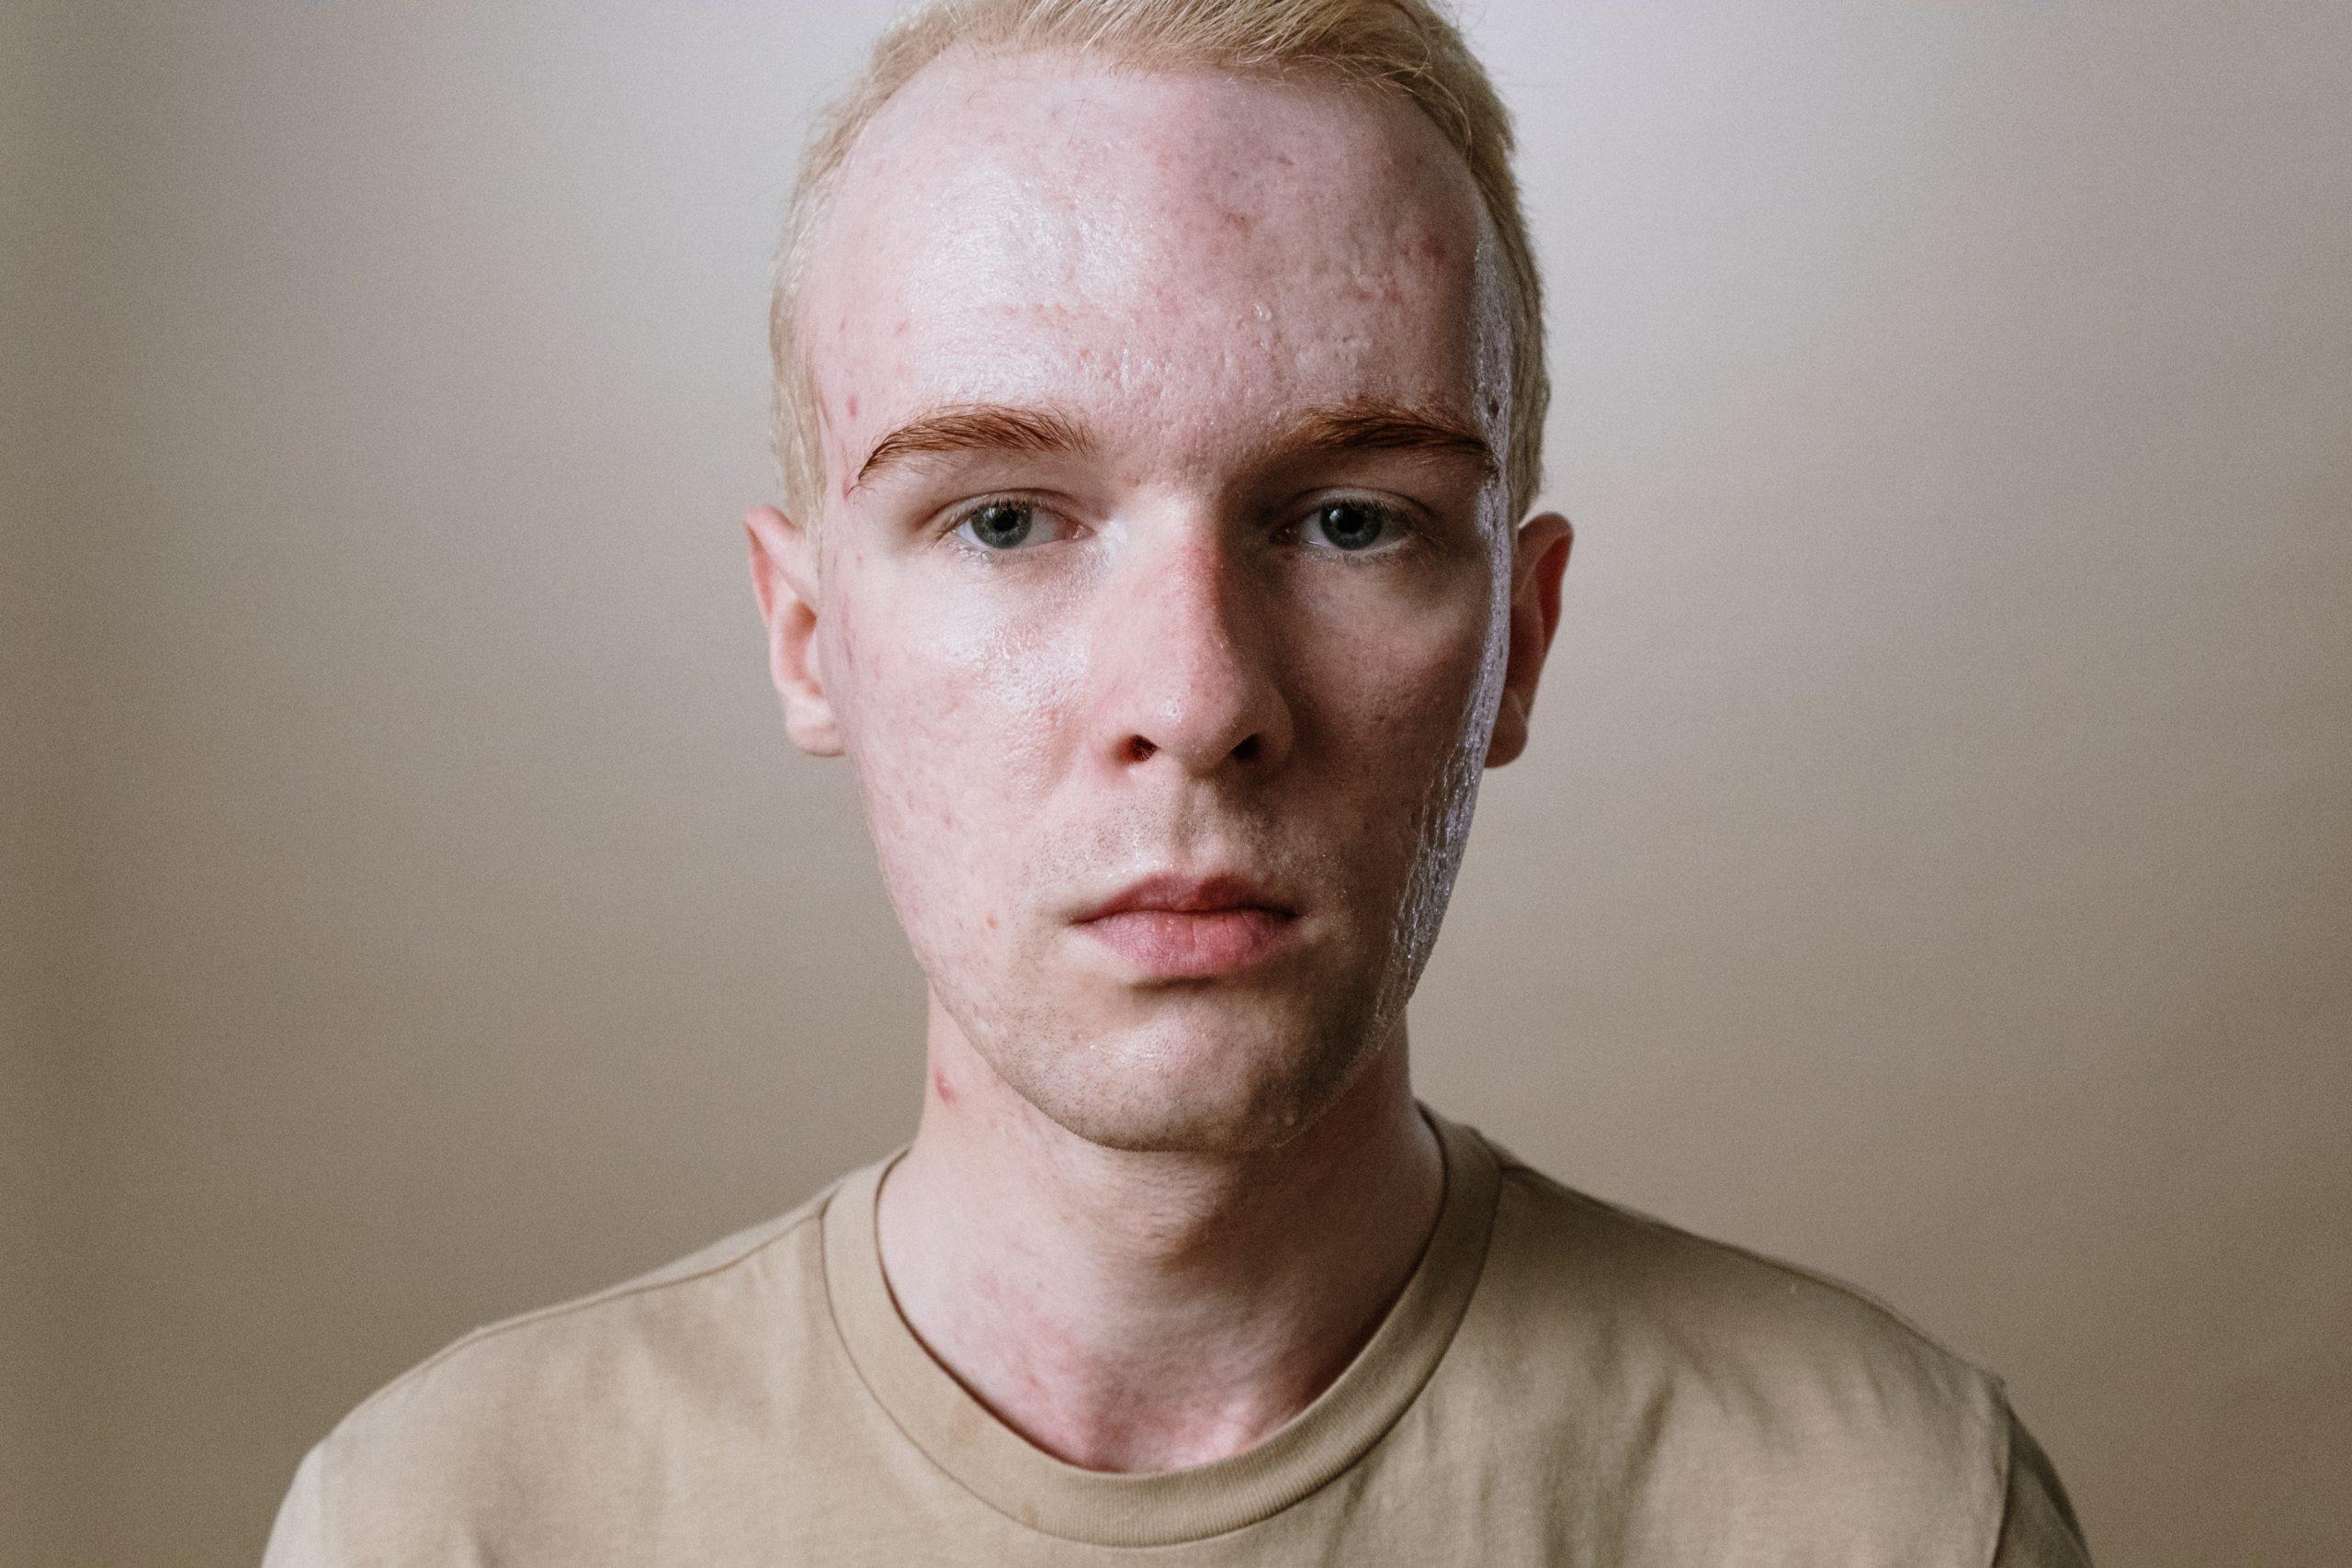 Acne Scars vs. Hyperpigmentation